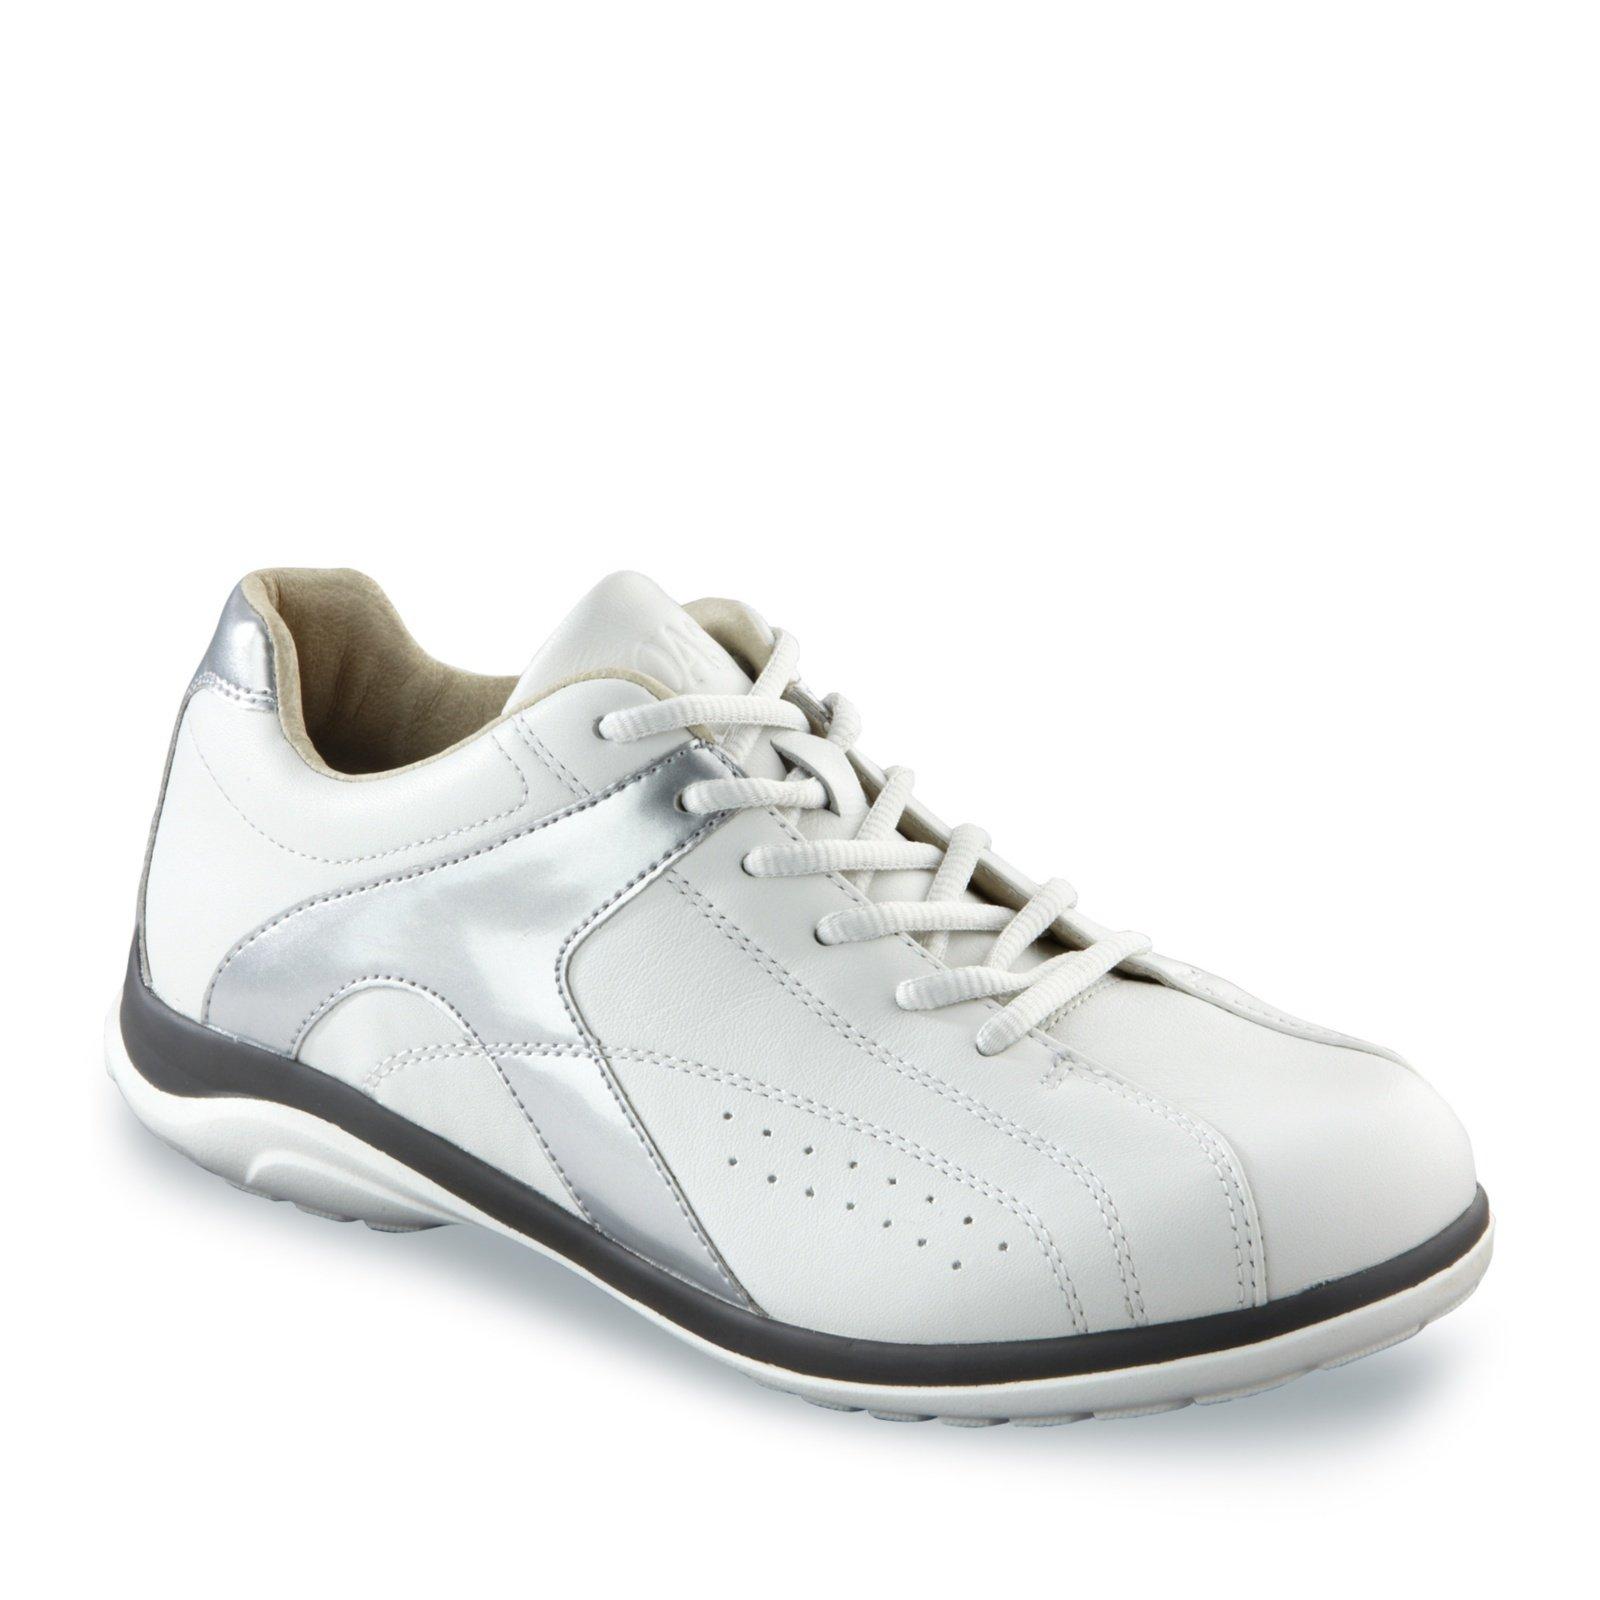 Oasis Women's Chrissie Lace-Up Shoes, White/Silver, 7 M/C-D